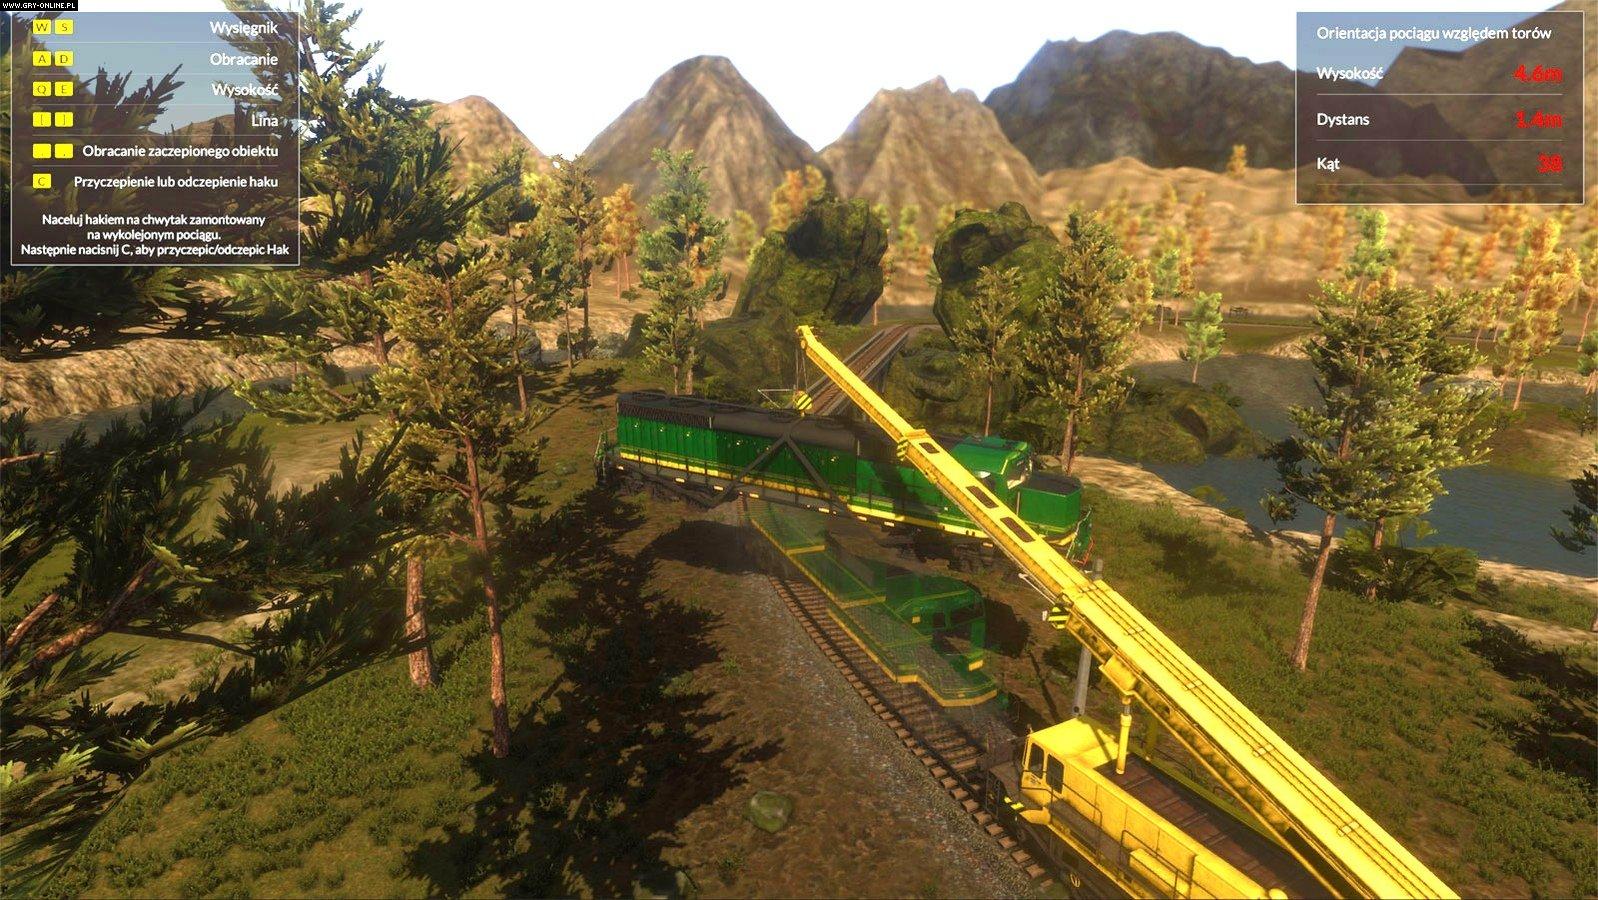 Train Mechanic Simulator 2017 PC Games Image 4/38, Si7 Studio, PlayWay